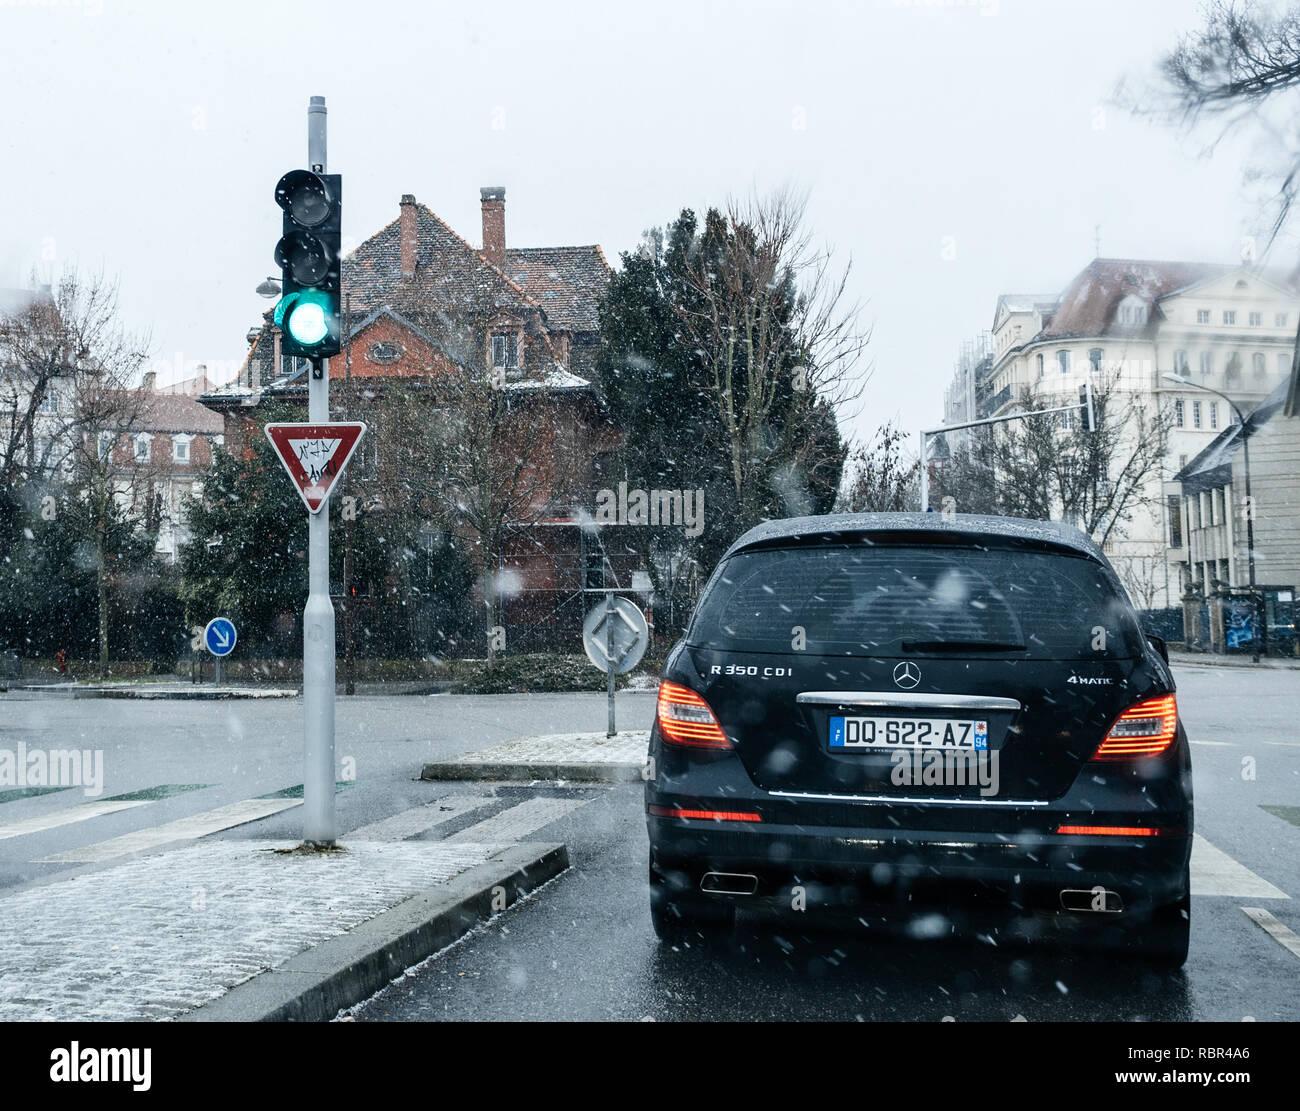 Diesel Car Stock Photos & Diesel Car Stock Images - Alamy